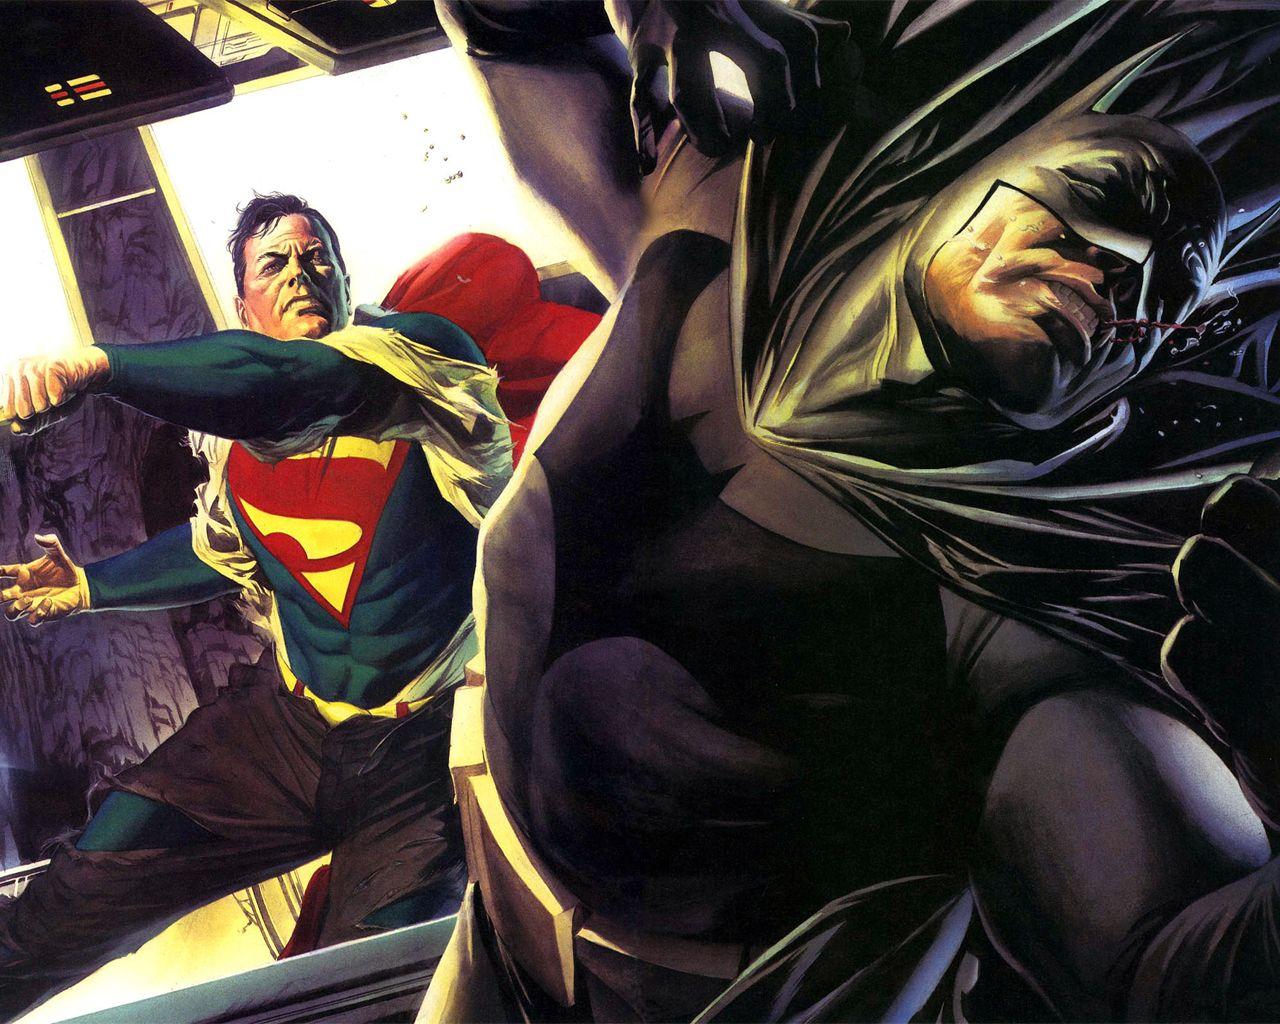 http://4.bp.blogspot.com/-x4ogk0Ag05s/TkItQnnQhuI/AAAAAAAAAqI/WoJLAtp05dA/s1600/superman-vs-batman1.jpg